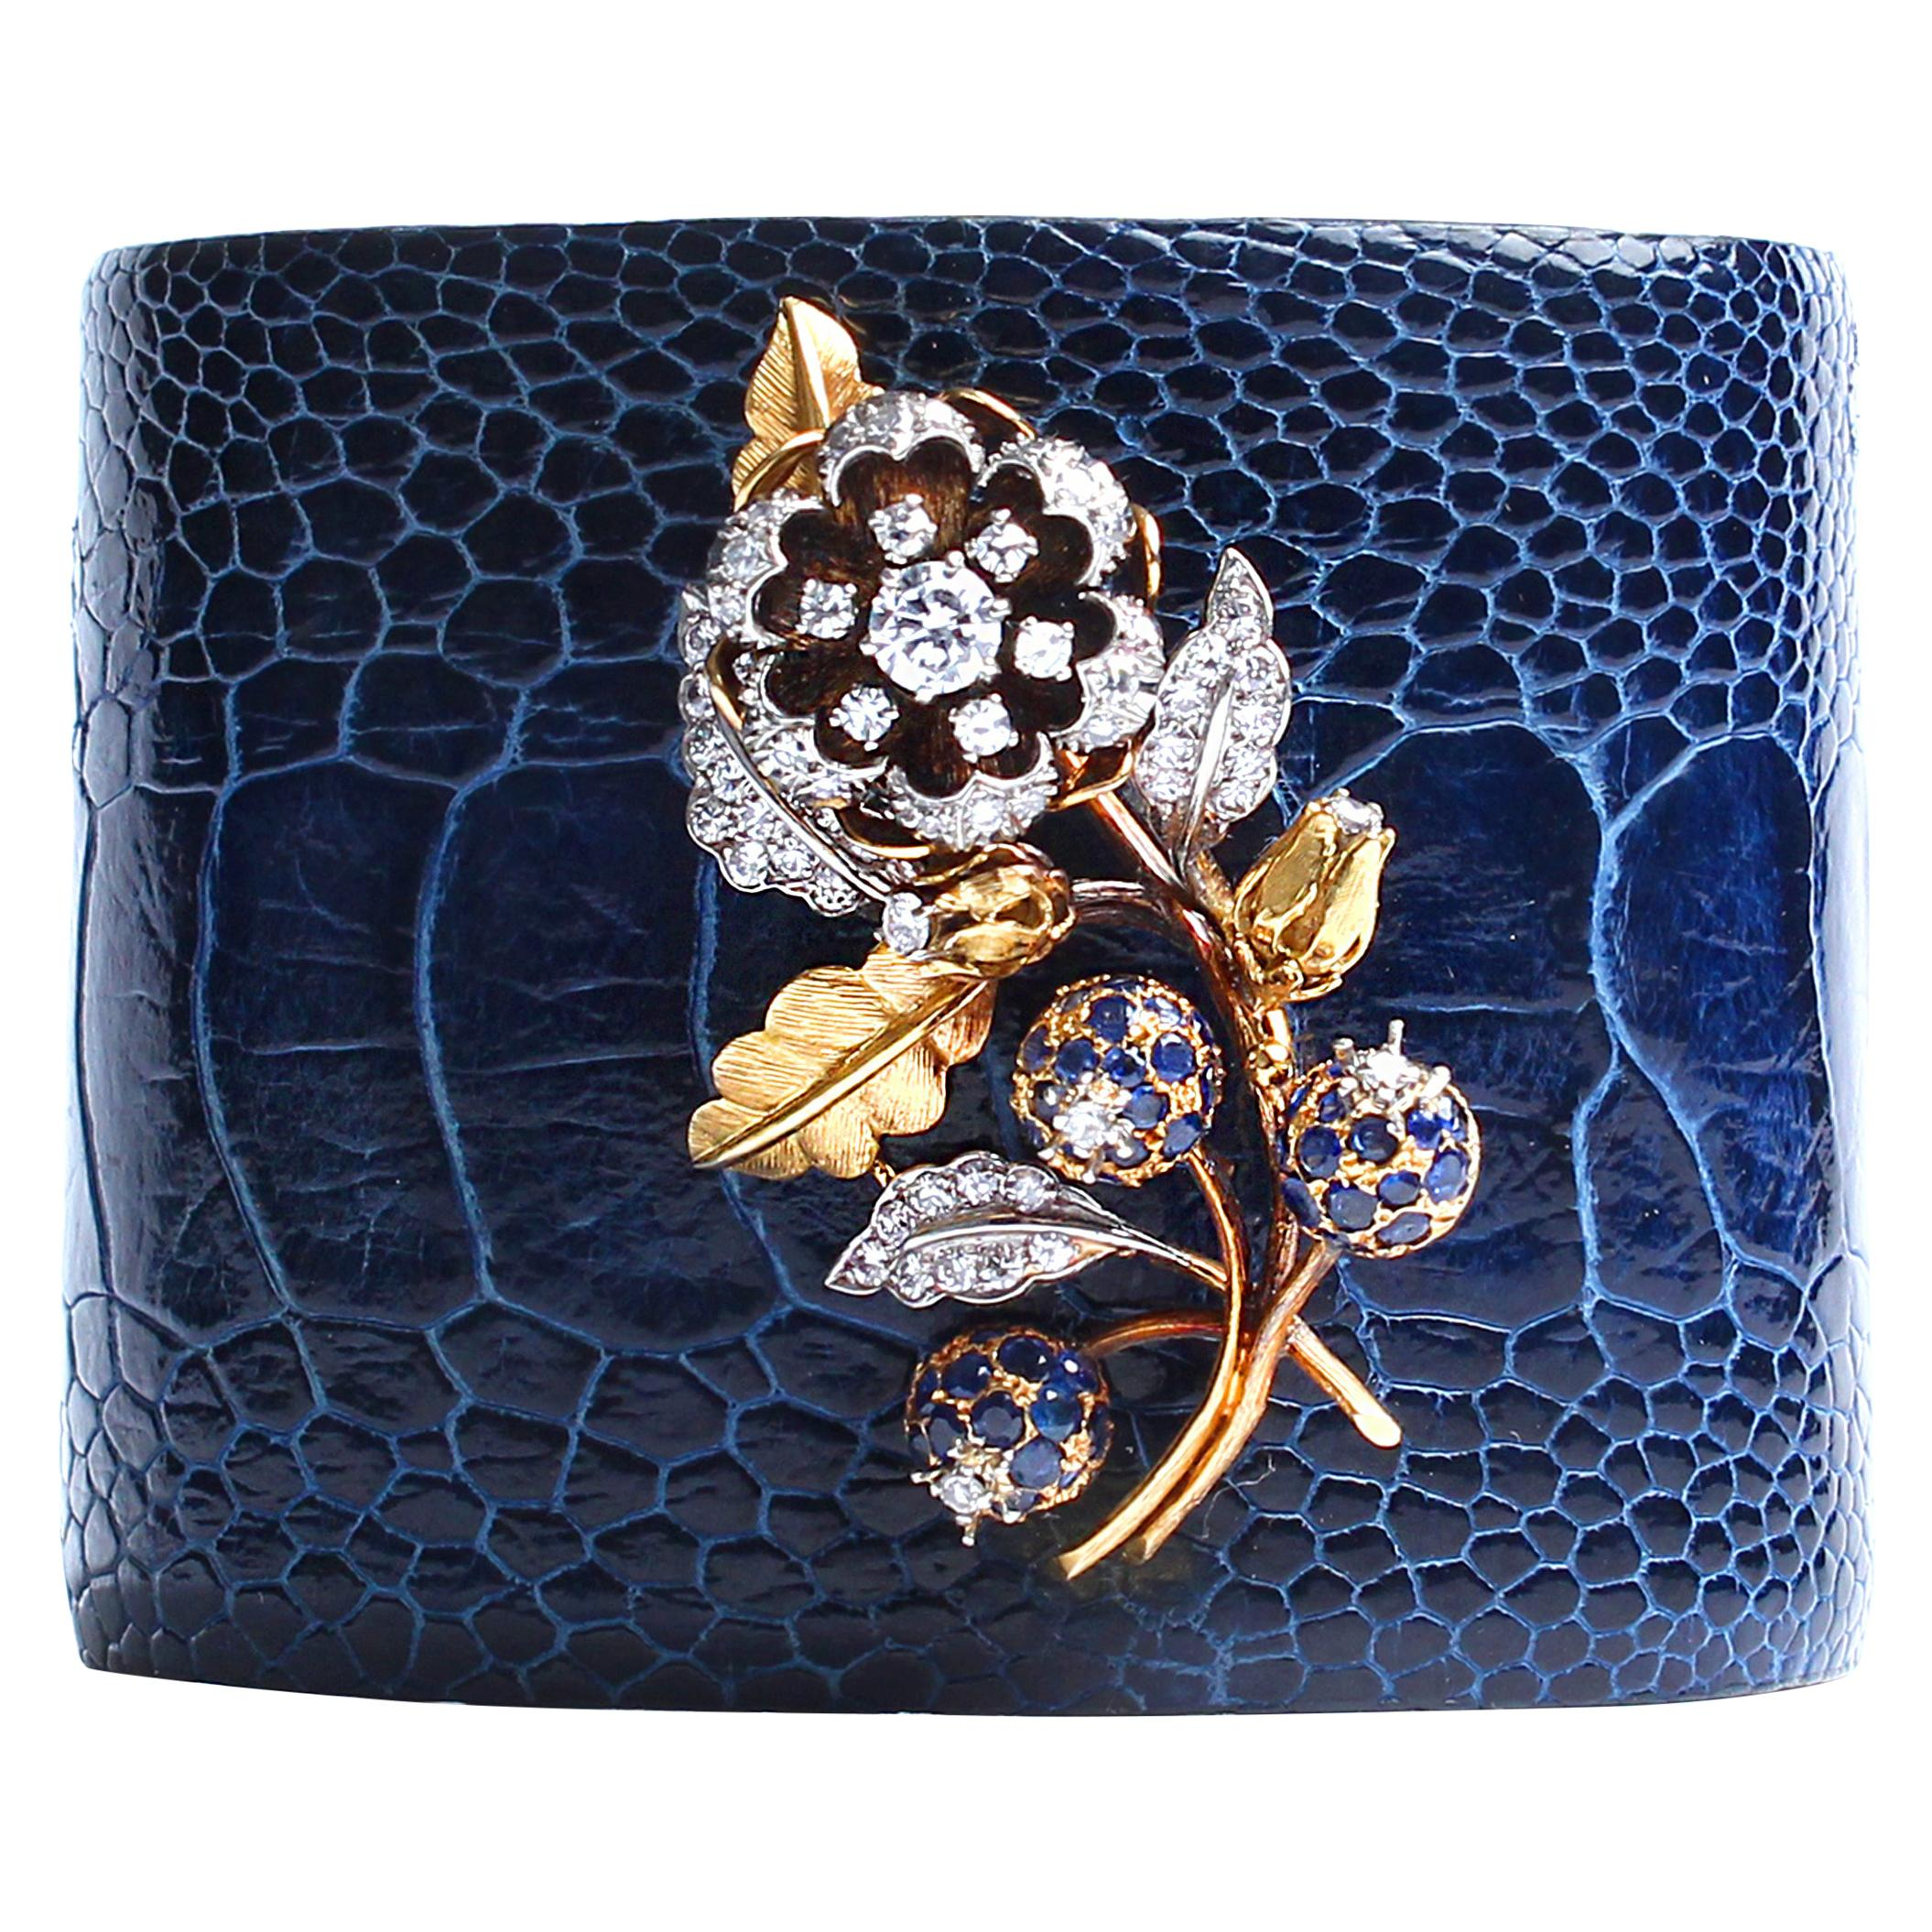 Clarissa Bronfman Crocodile Cuff 14k Gold Sapphire Diamond Flower Charm Cuff